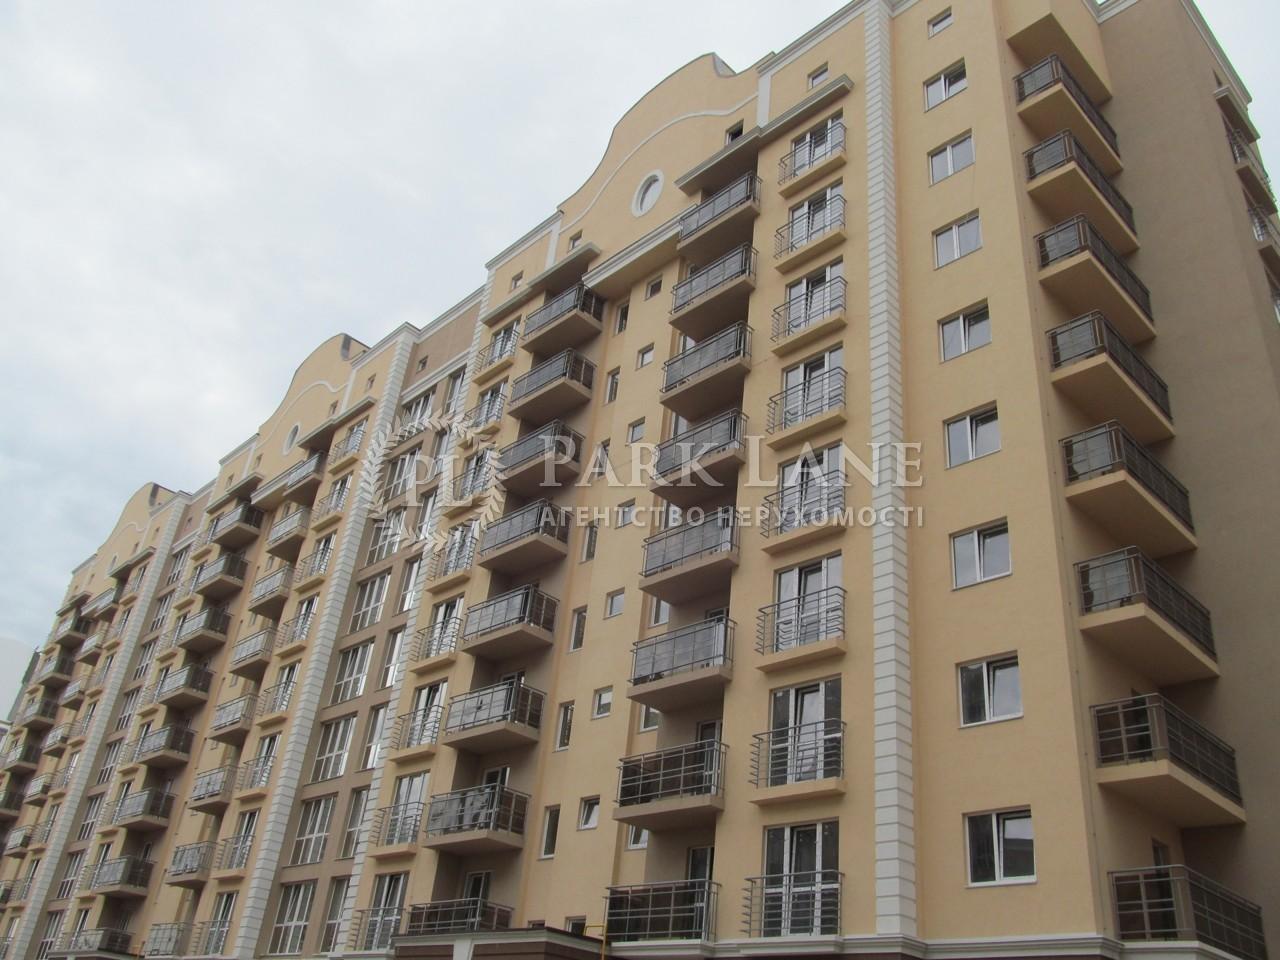 Квартира B-96542, Метрологическая, 9д, Киев - Фото 3